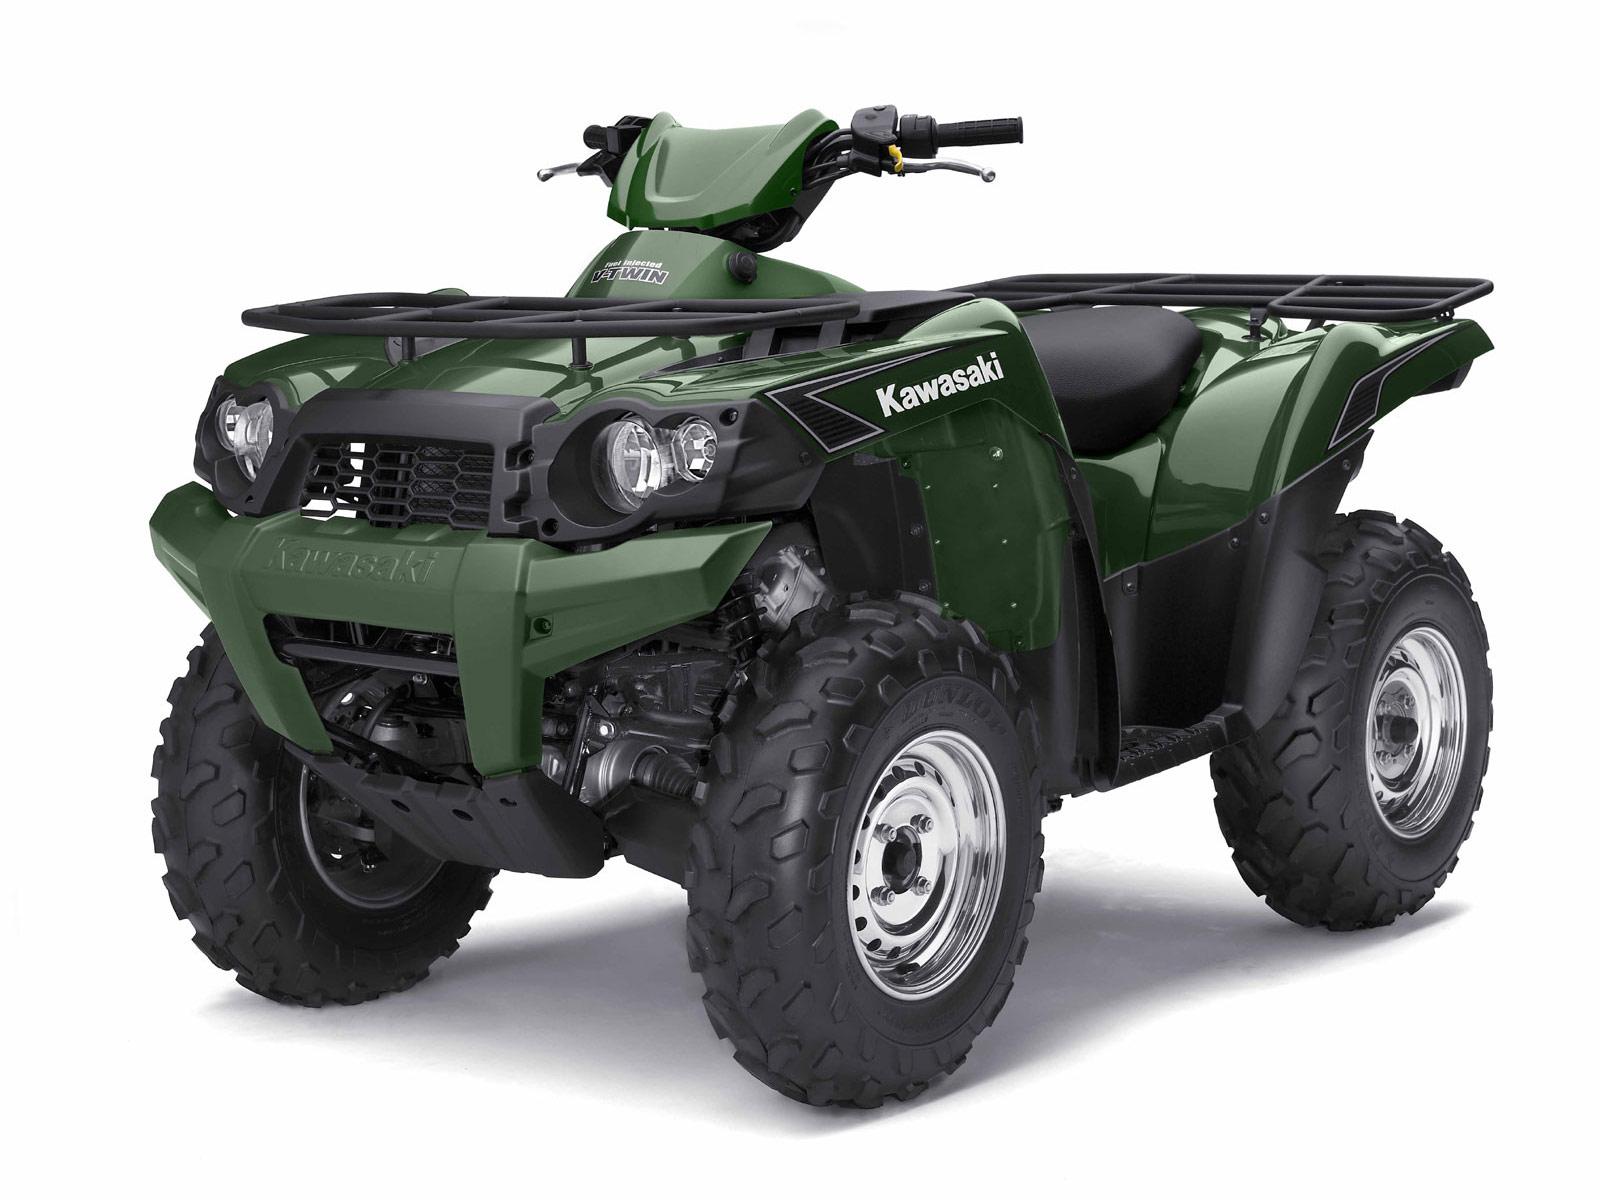 Kawasaki Brute Force Fuel Pump